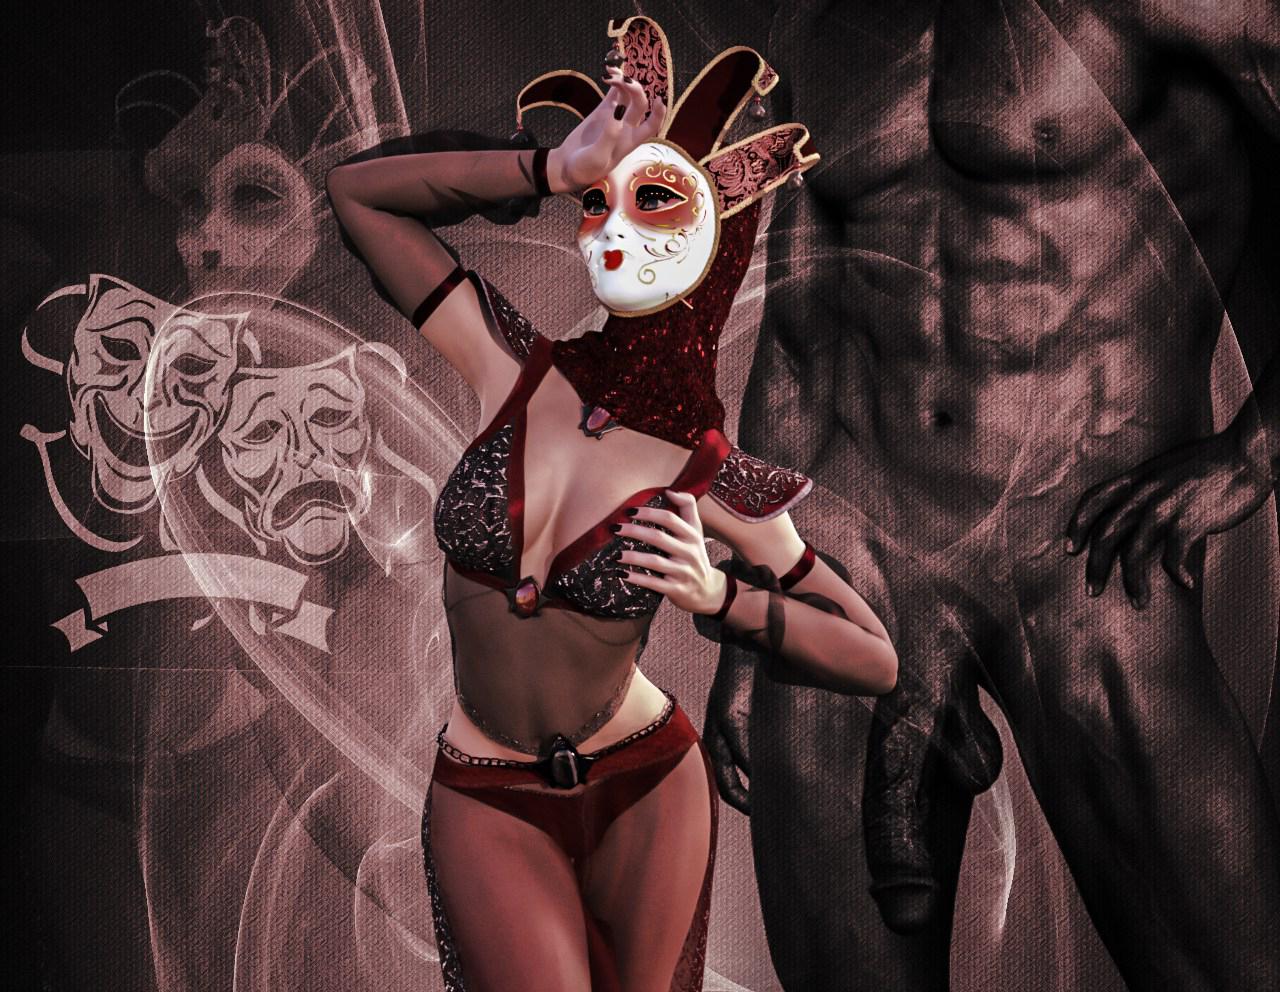 Cuckold Psychology – Erotic Theatre